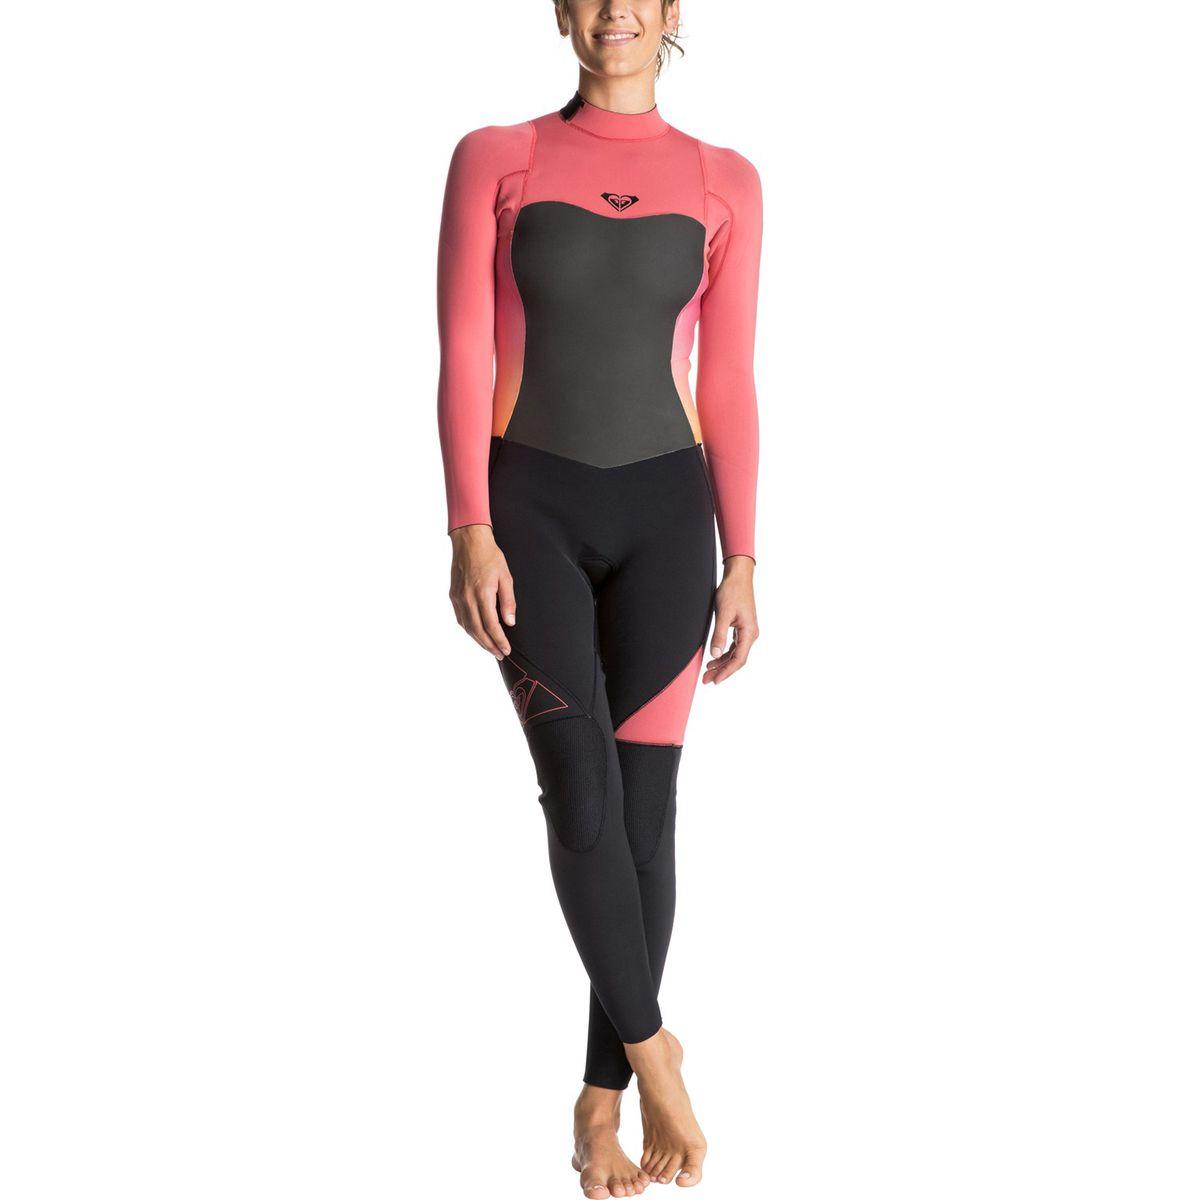 18c939eff2a Roxy 4 3 Syncro Back Zip GBS Wetsuit Womens